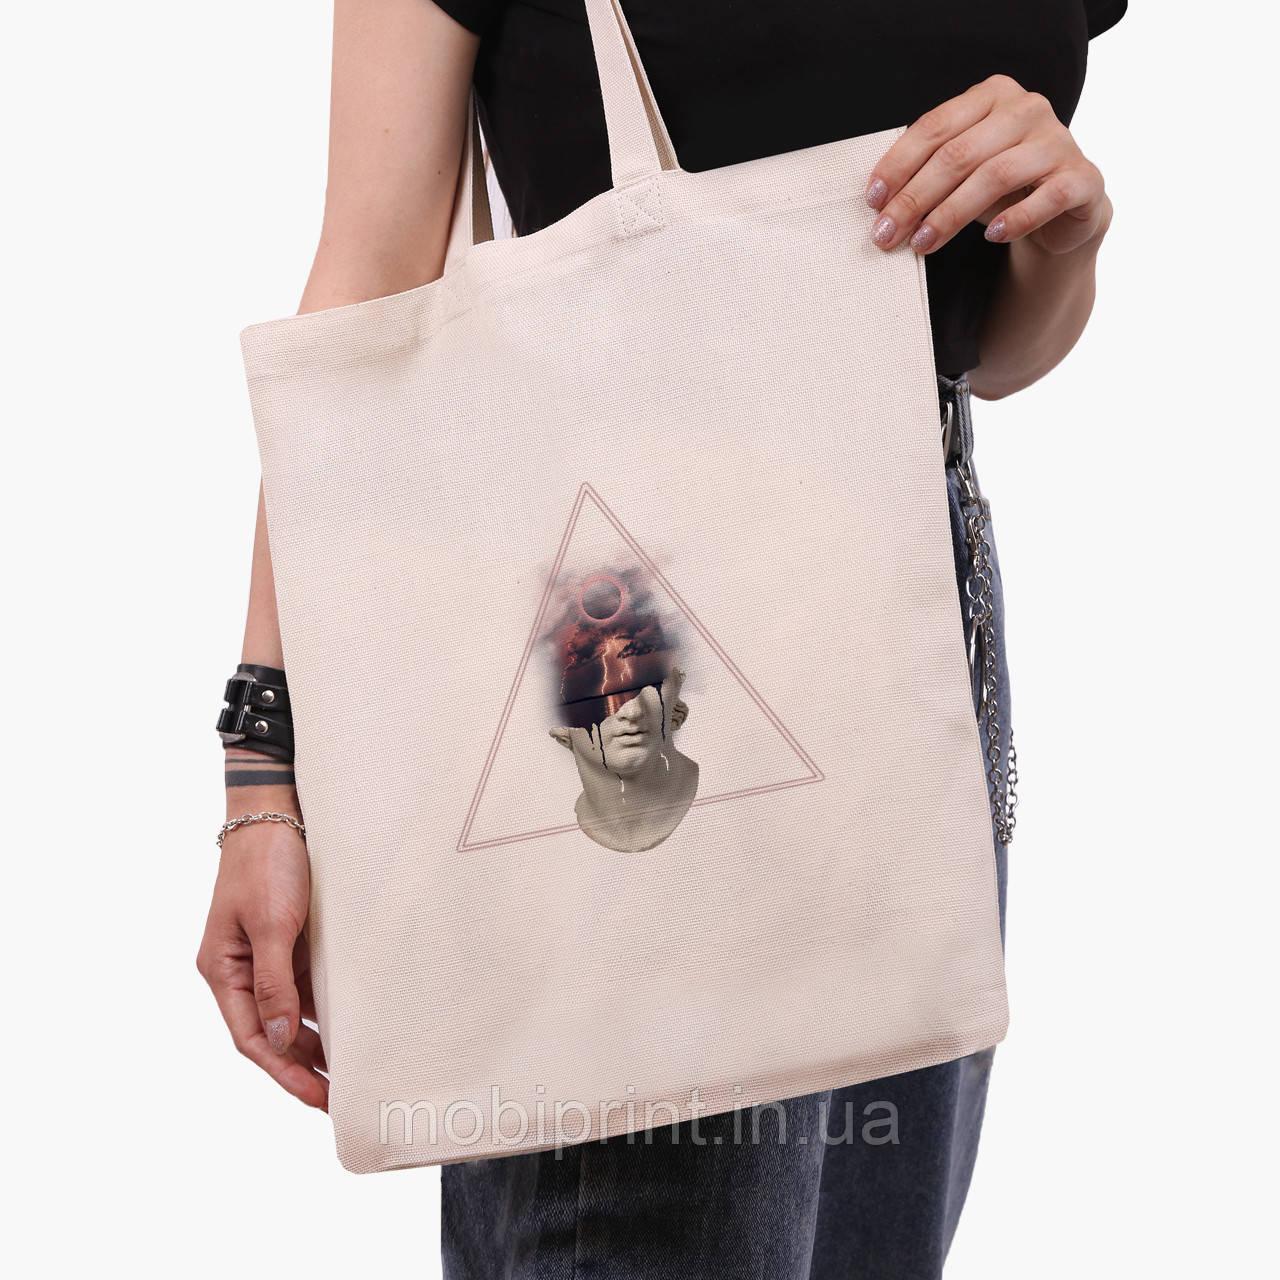 Еко сумка шоппер Ренесанс-Олександр Великий (Alexander the Great) (9227-1586) екосумка шопер 41*35 см